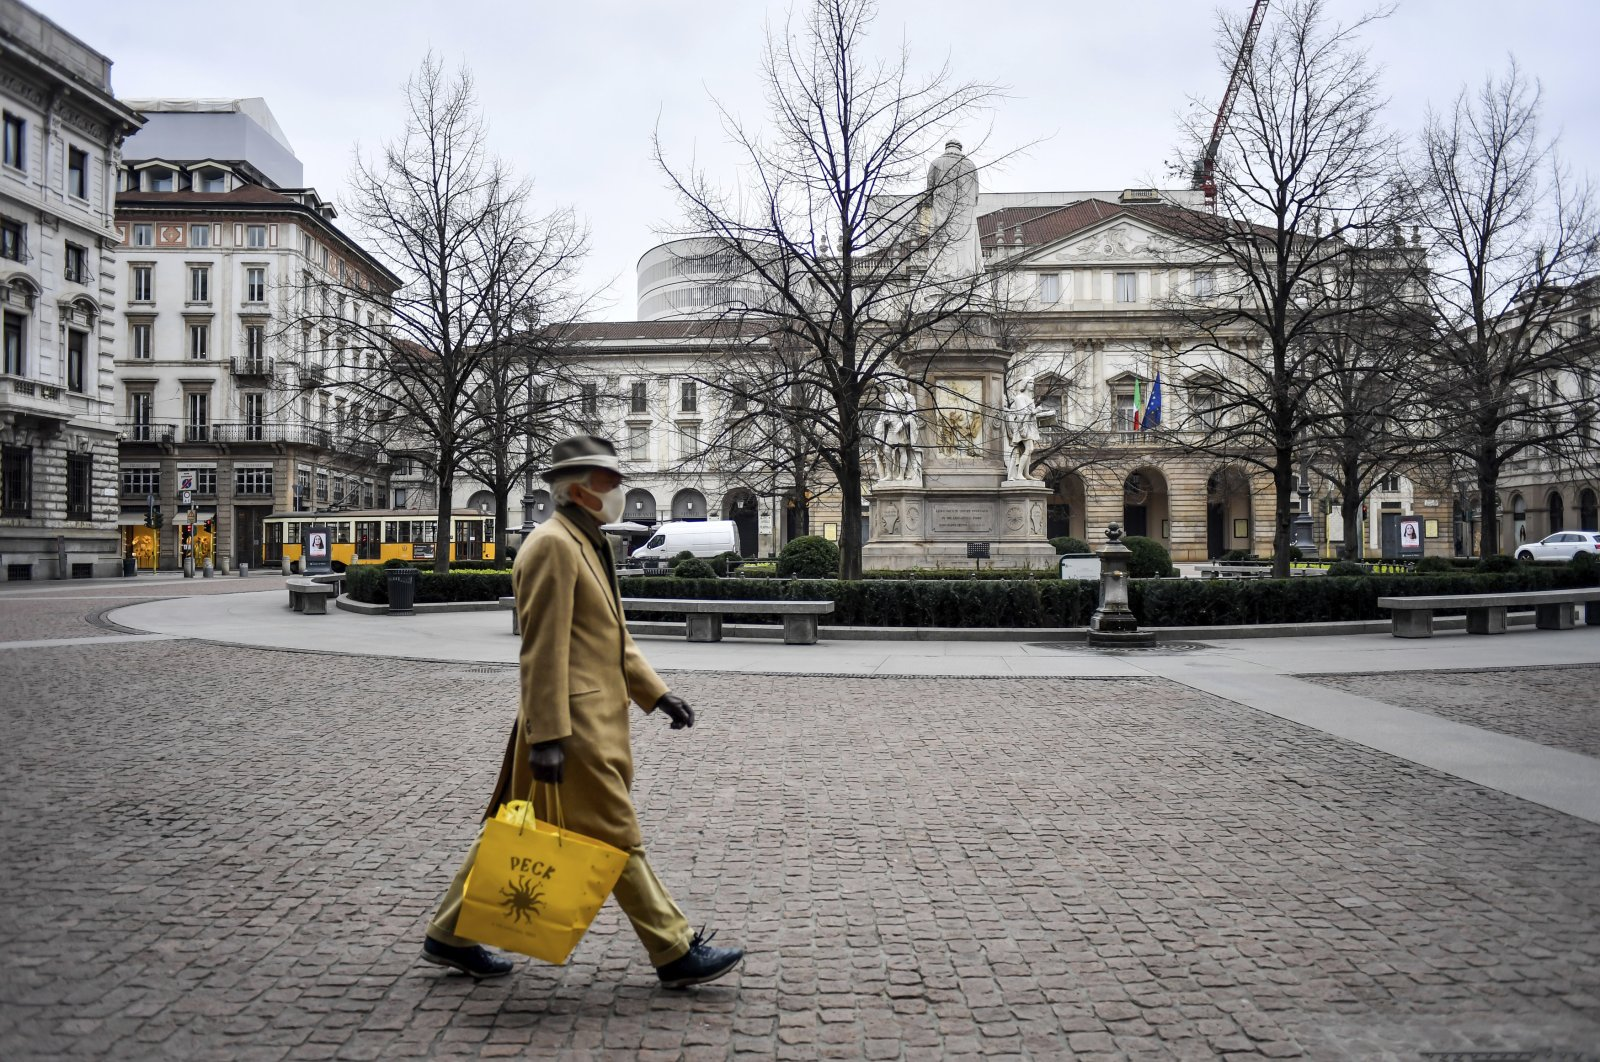 A man walks in Piazza della Scala square in Milan, Italy, Thursday, March 12, 2020. (AP Photo)